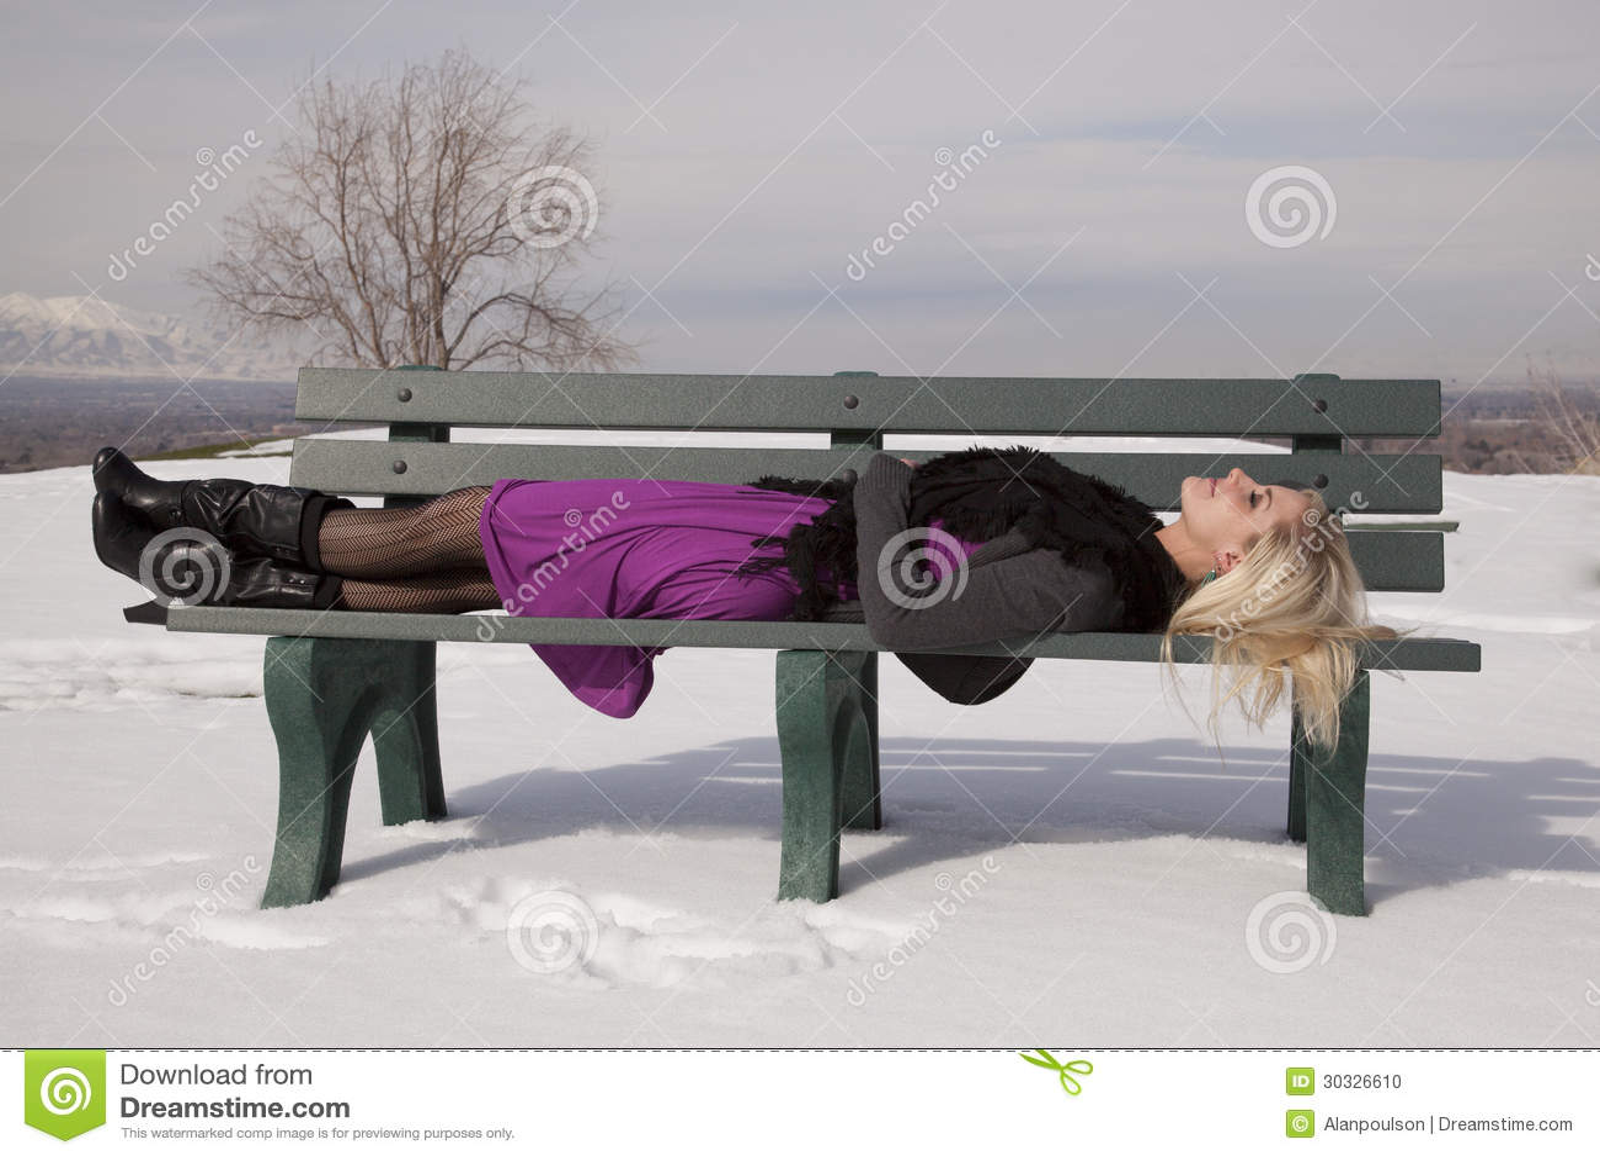 Woman Dress Lay On Bench Snow Stock Photo Image 30326610